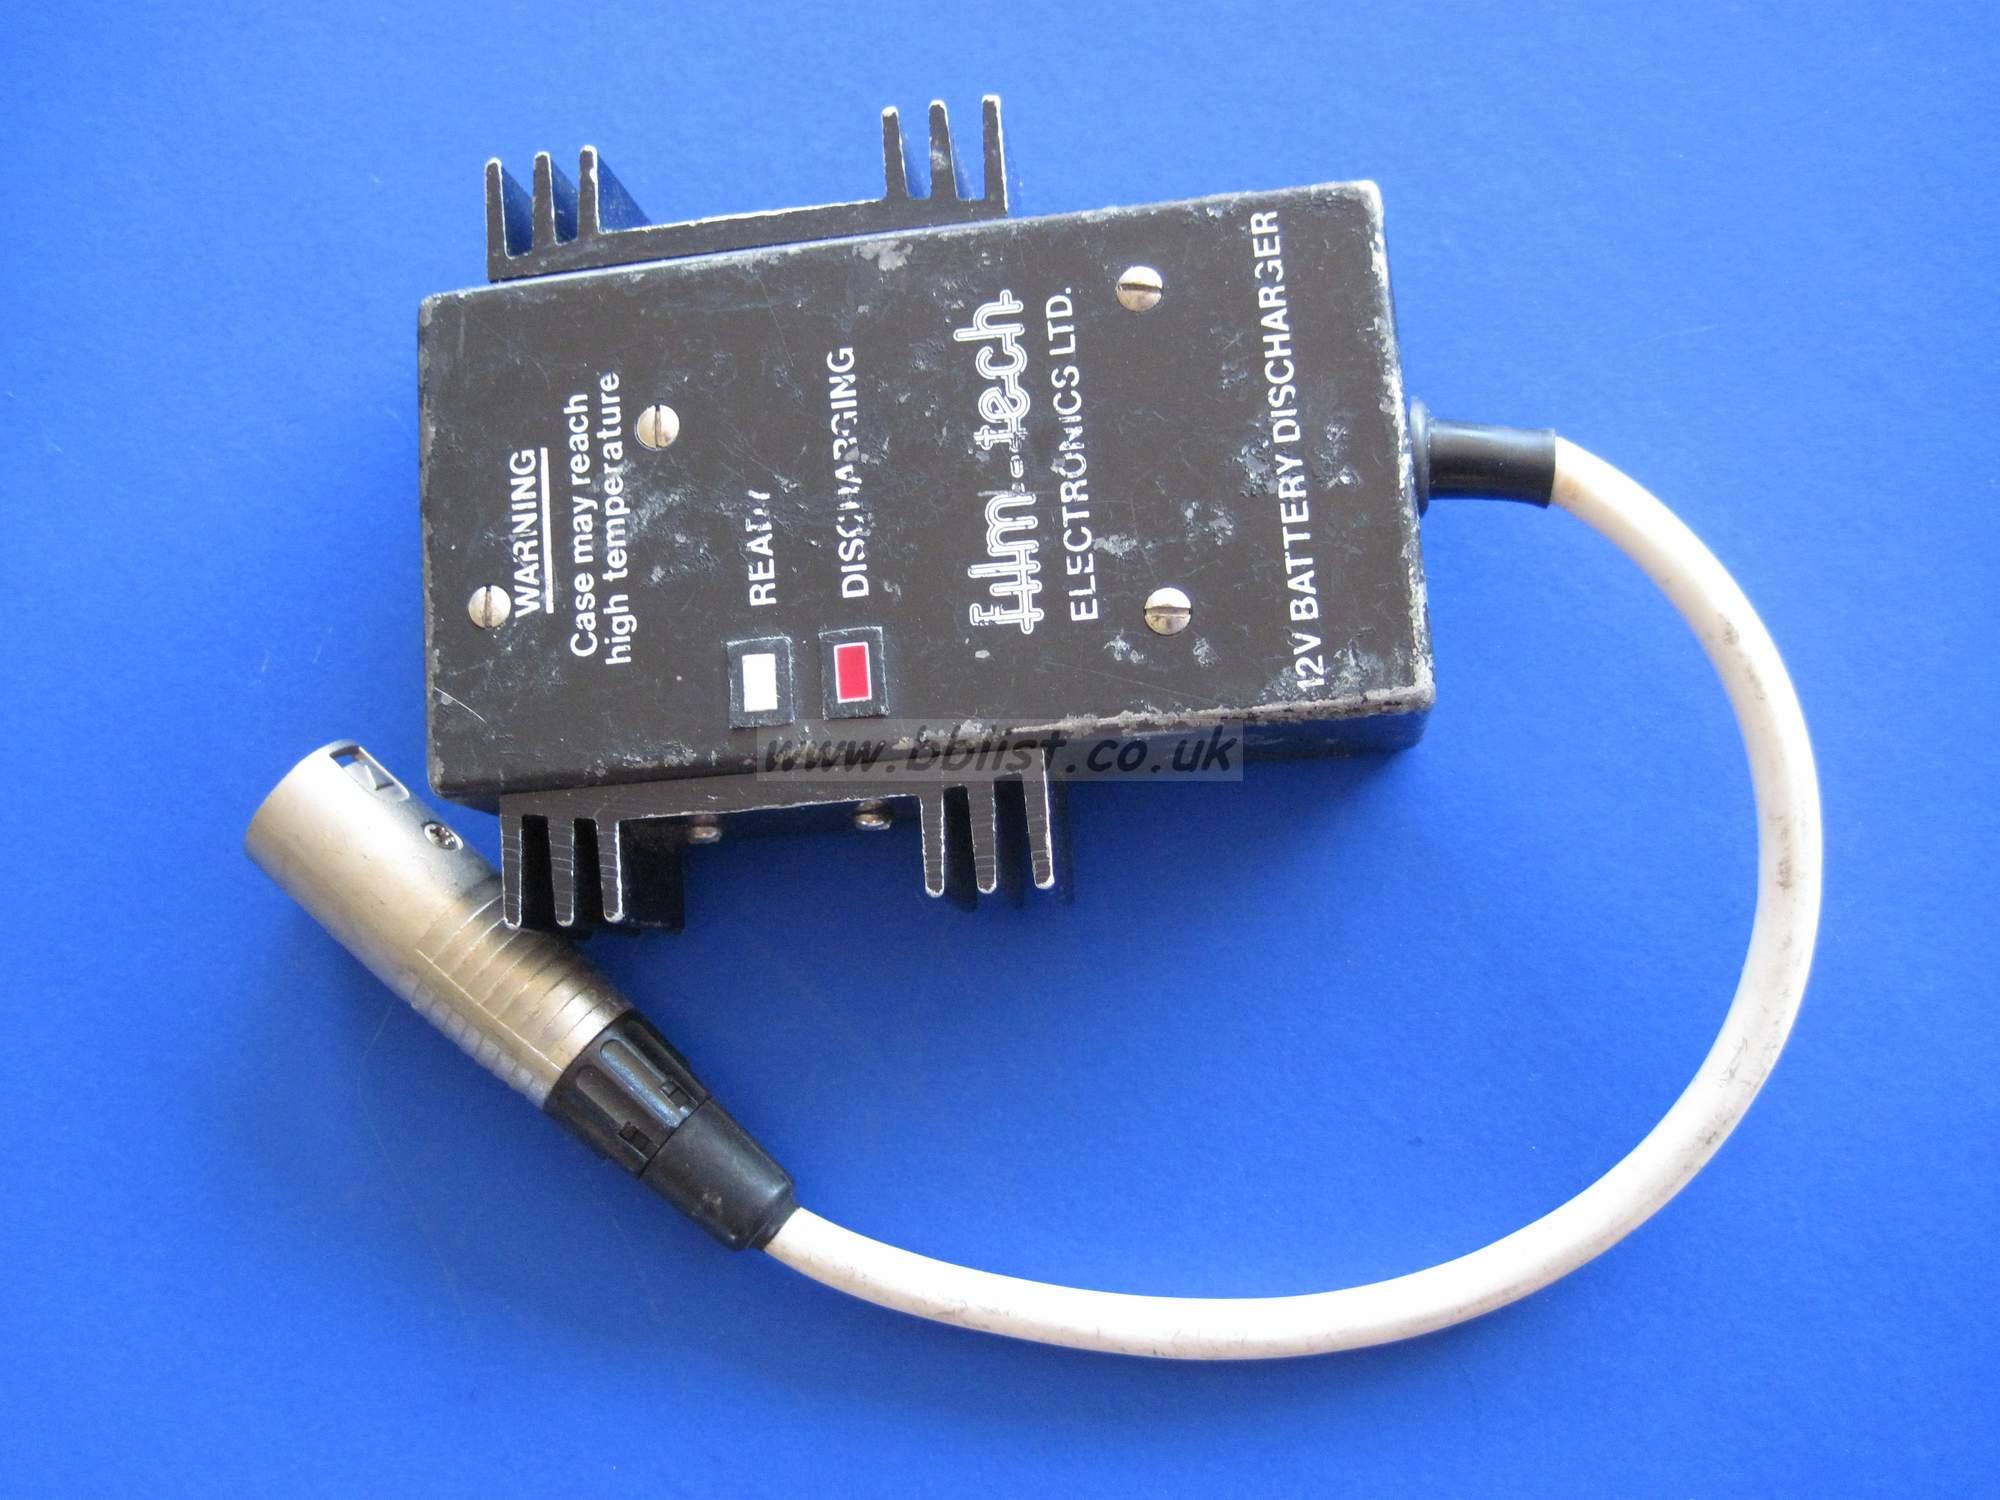 Battery Discharger 12V Battery Discharger 12V